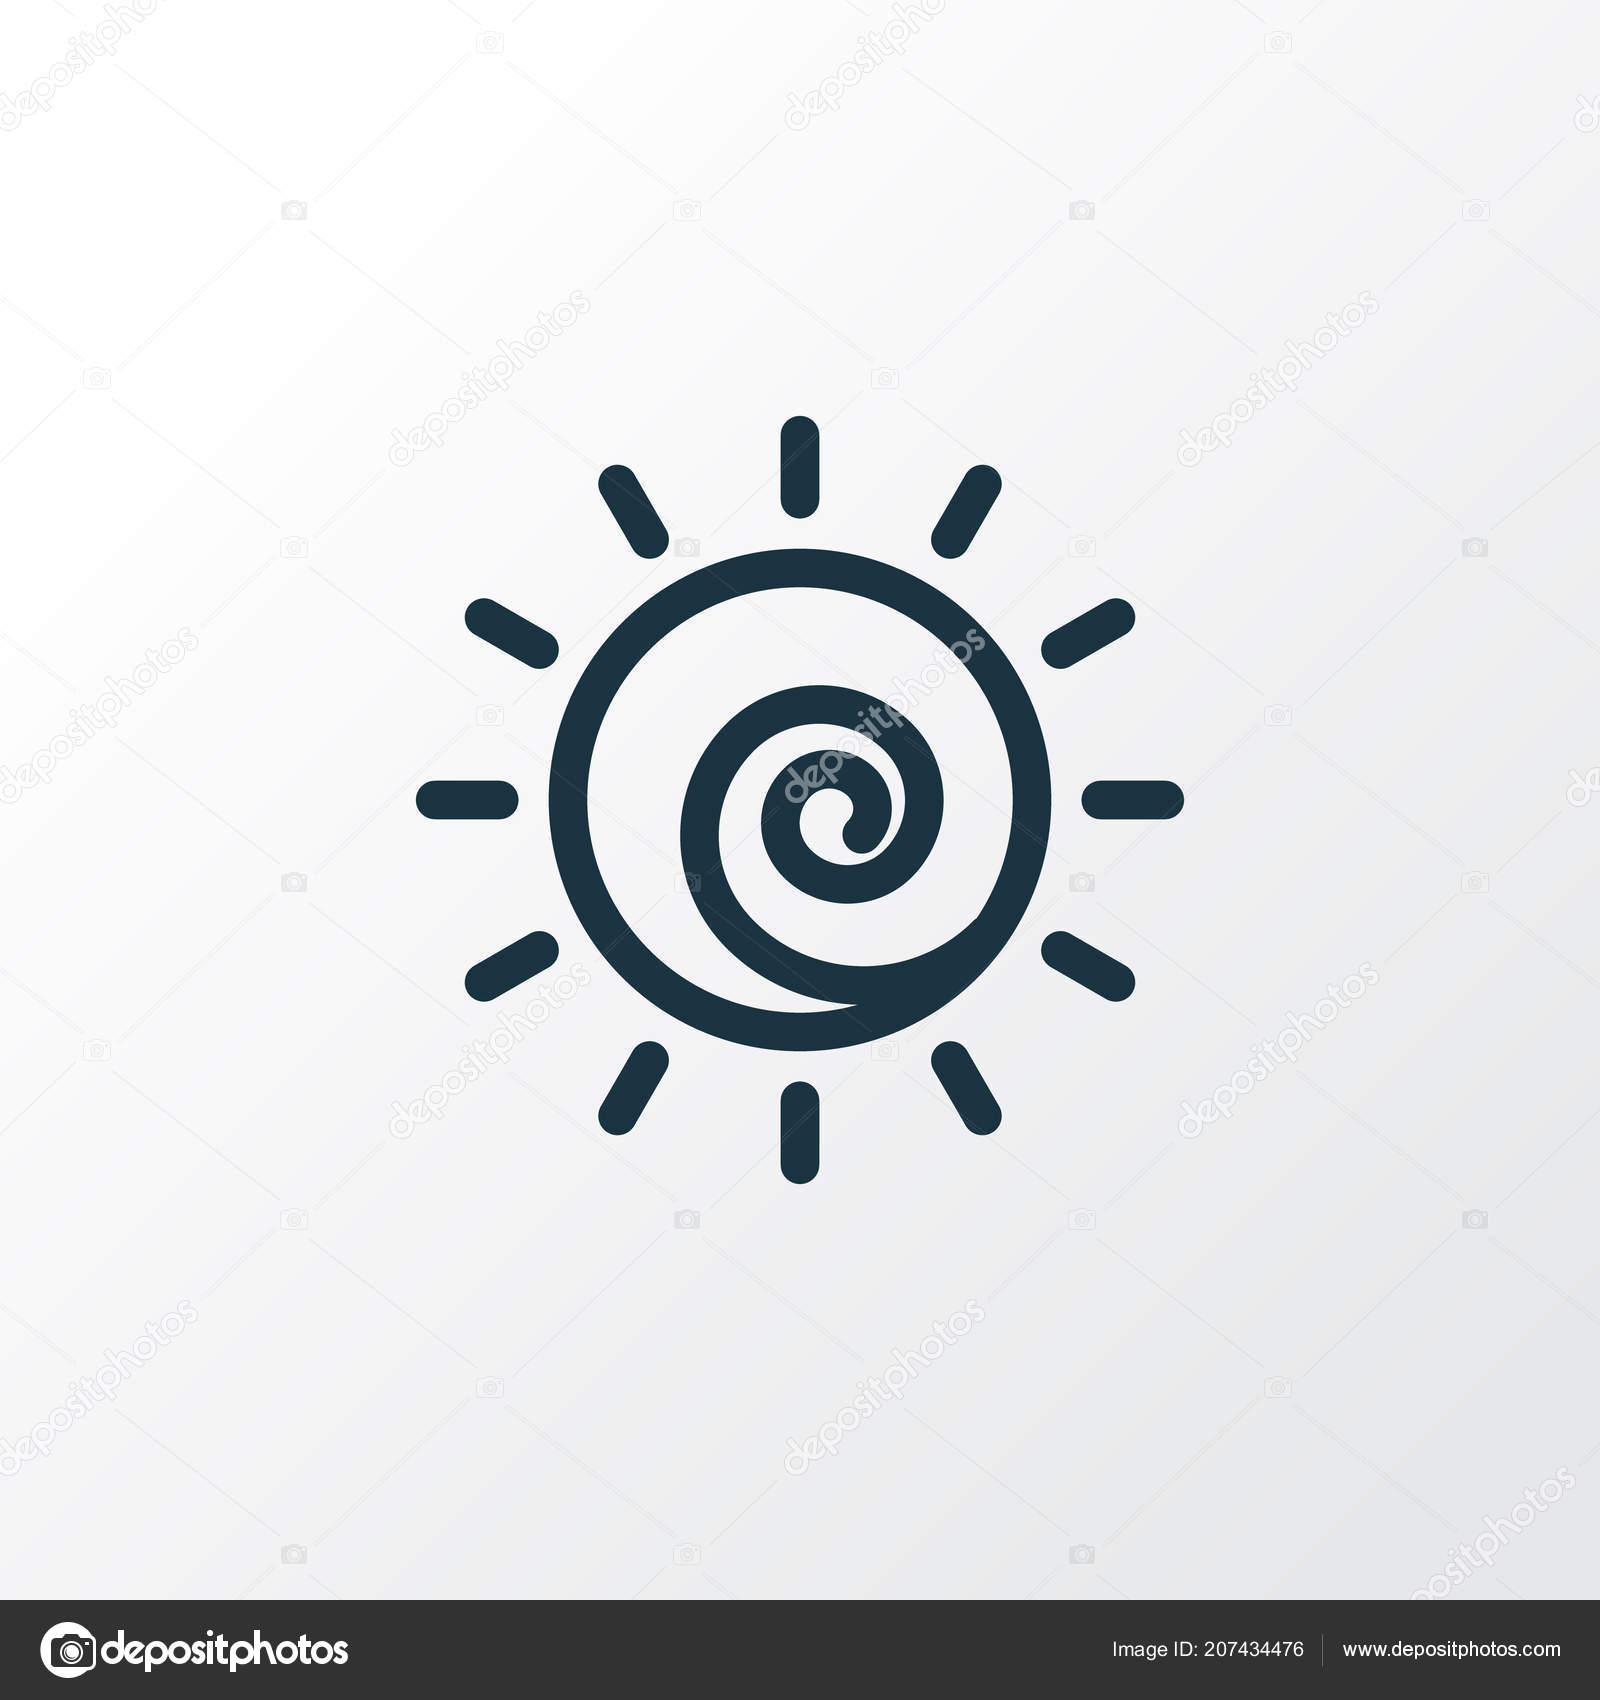 Sun icon line symbol  Premium quality isolated sunshine